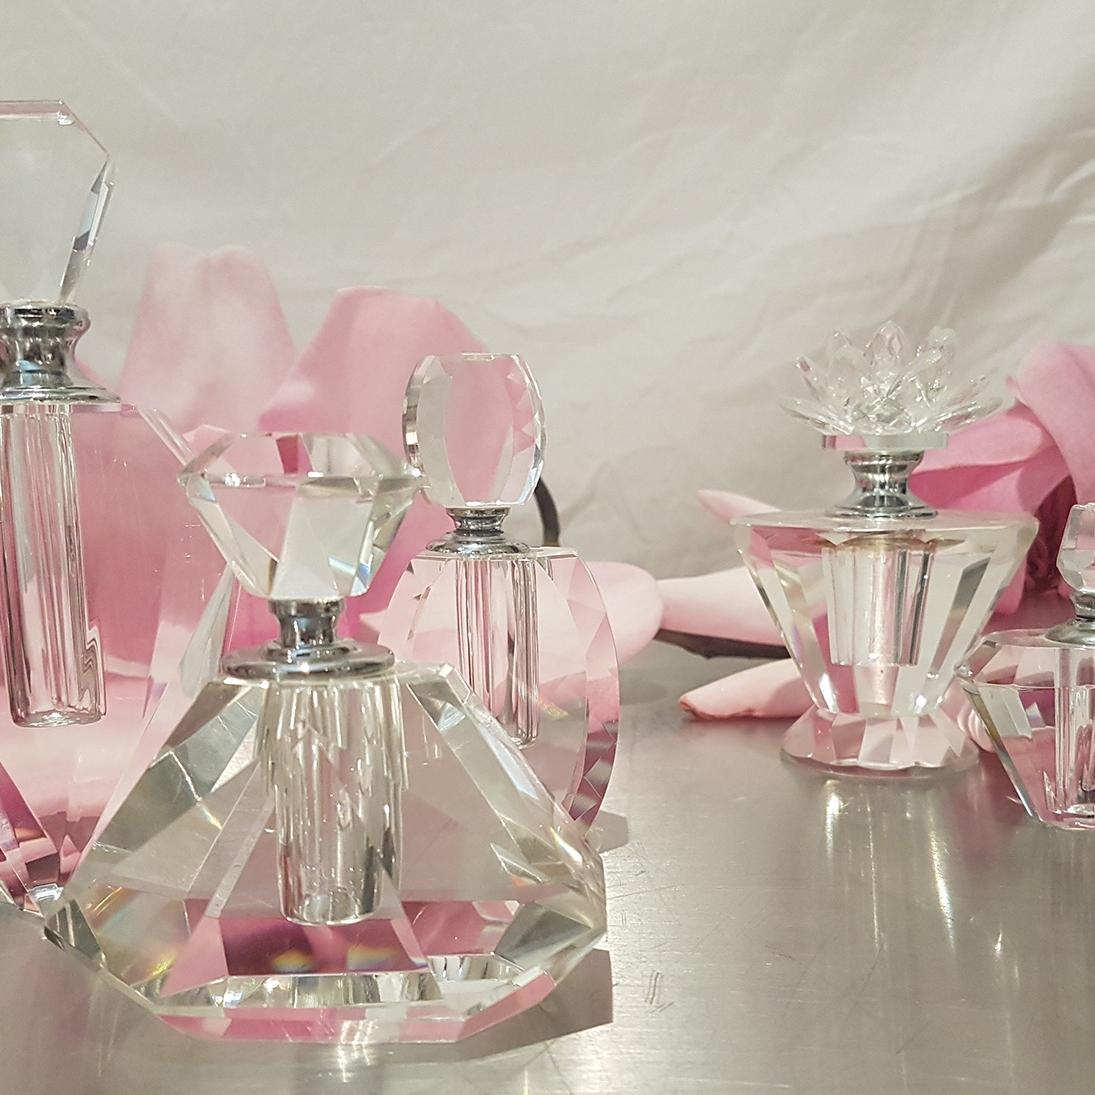 perfume .jpg 2 .jpg